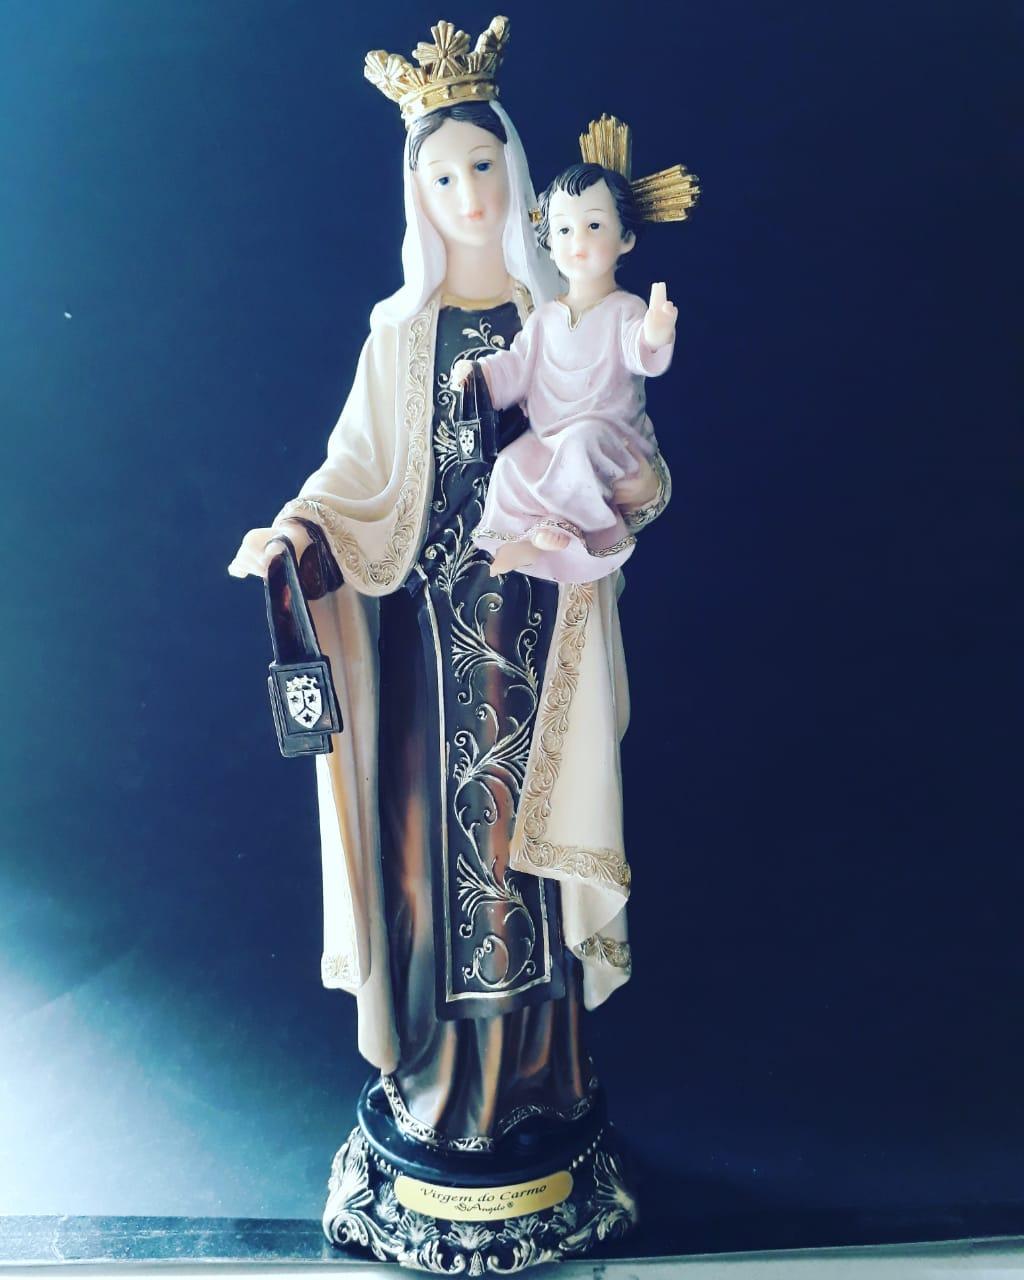 IS33026 - Nossa Senhora do Carmo 30cm Angelus Resina  - VindVedShop - Distribuidora Catolica